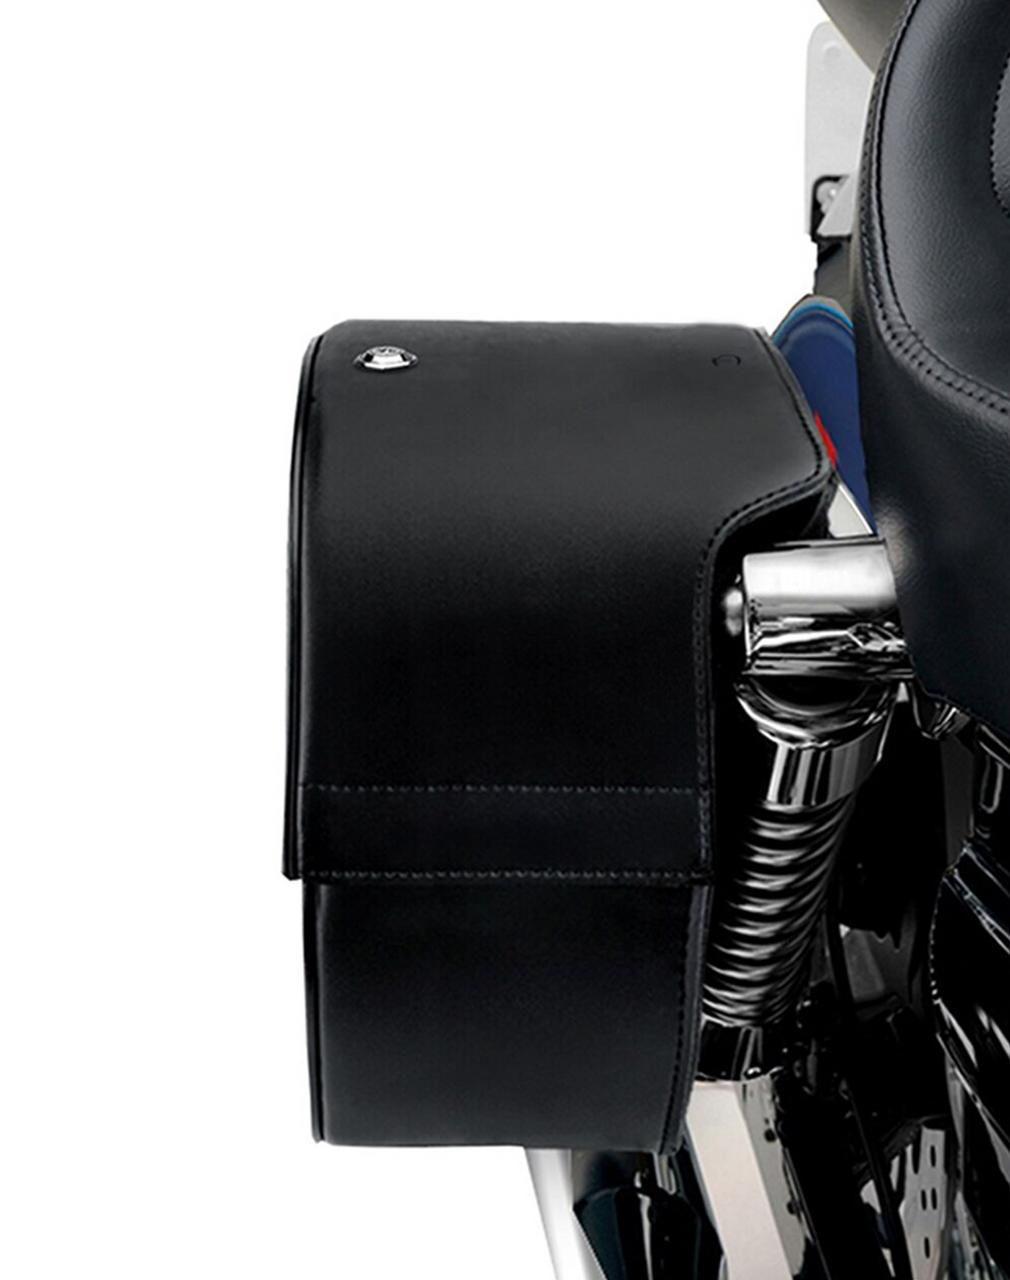 Kawasaki Vulcan 1500 Classic SS Vikingcycle Shock Cutout Slanted Studded Large Motorcycle Saddlebags Shock Cutout View